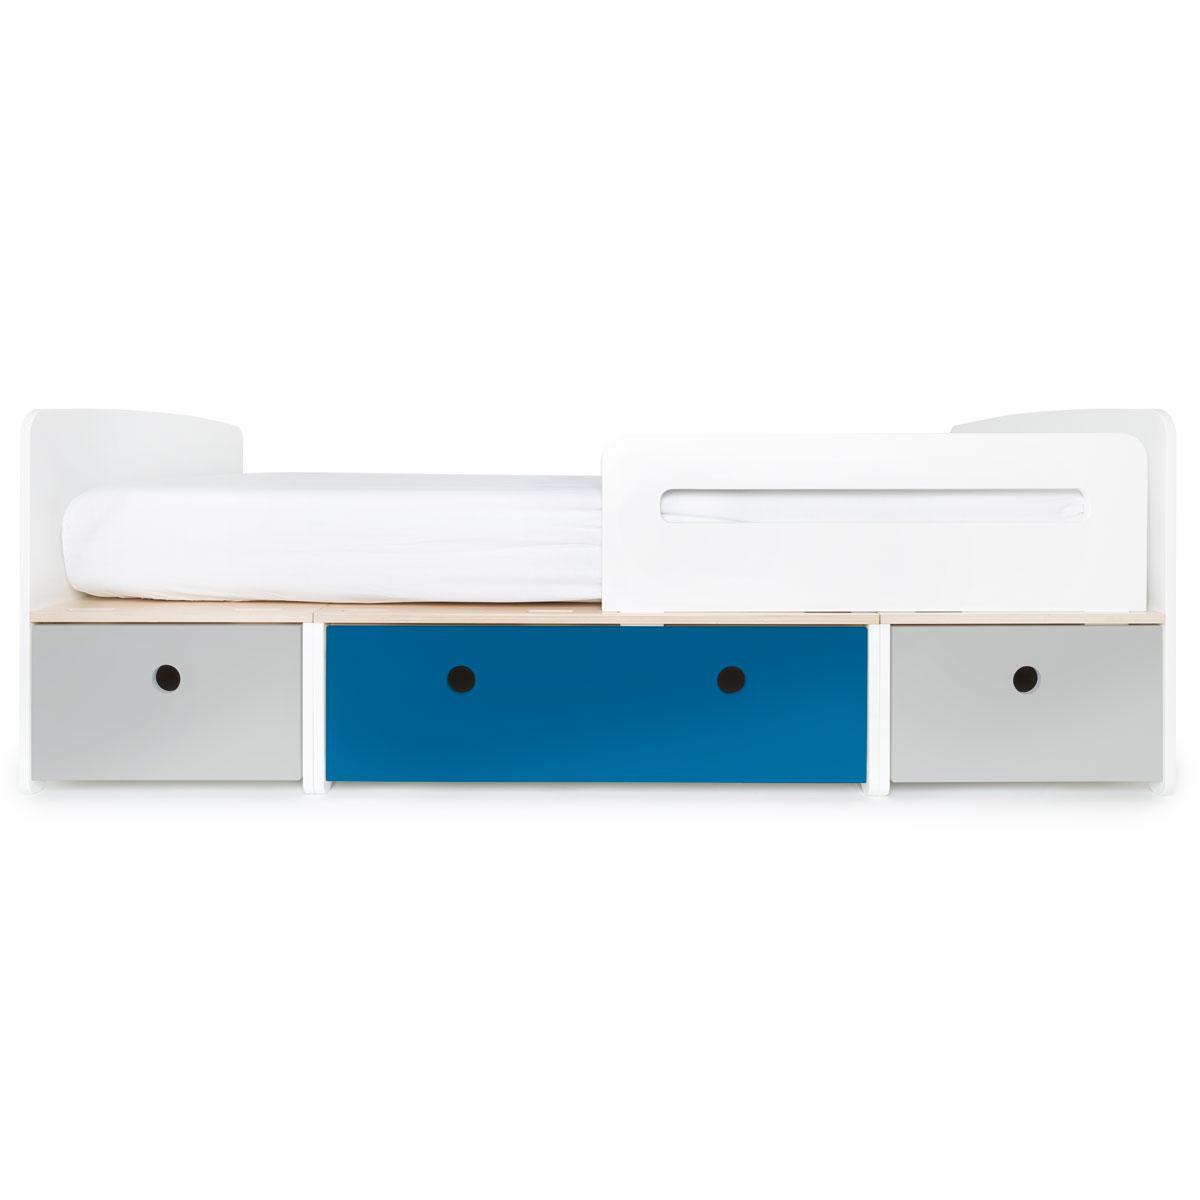 Kinderbett 90x200cm COLORFLEX pearl grey-deep marine-pearl grey